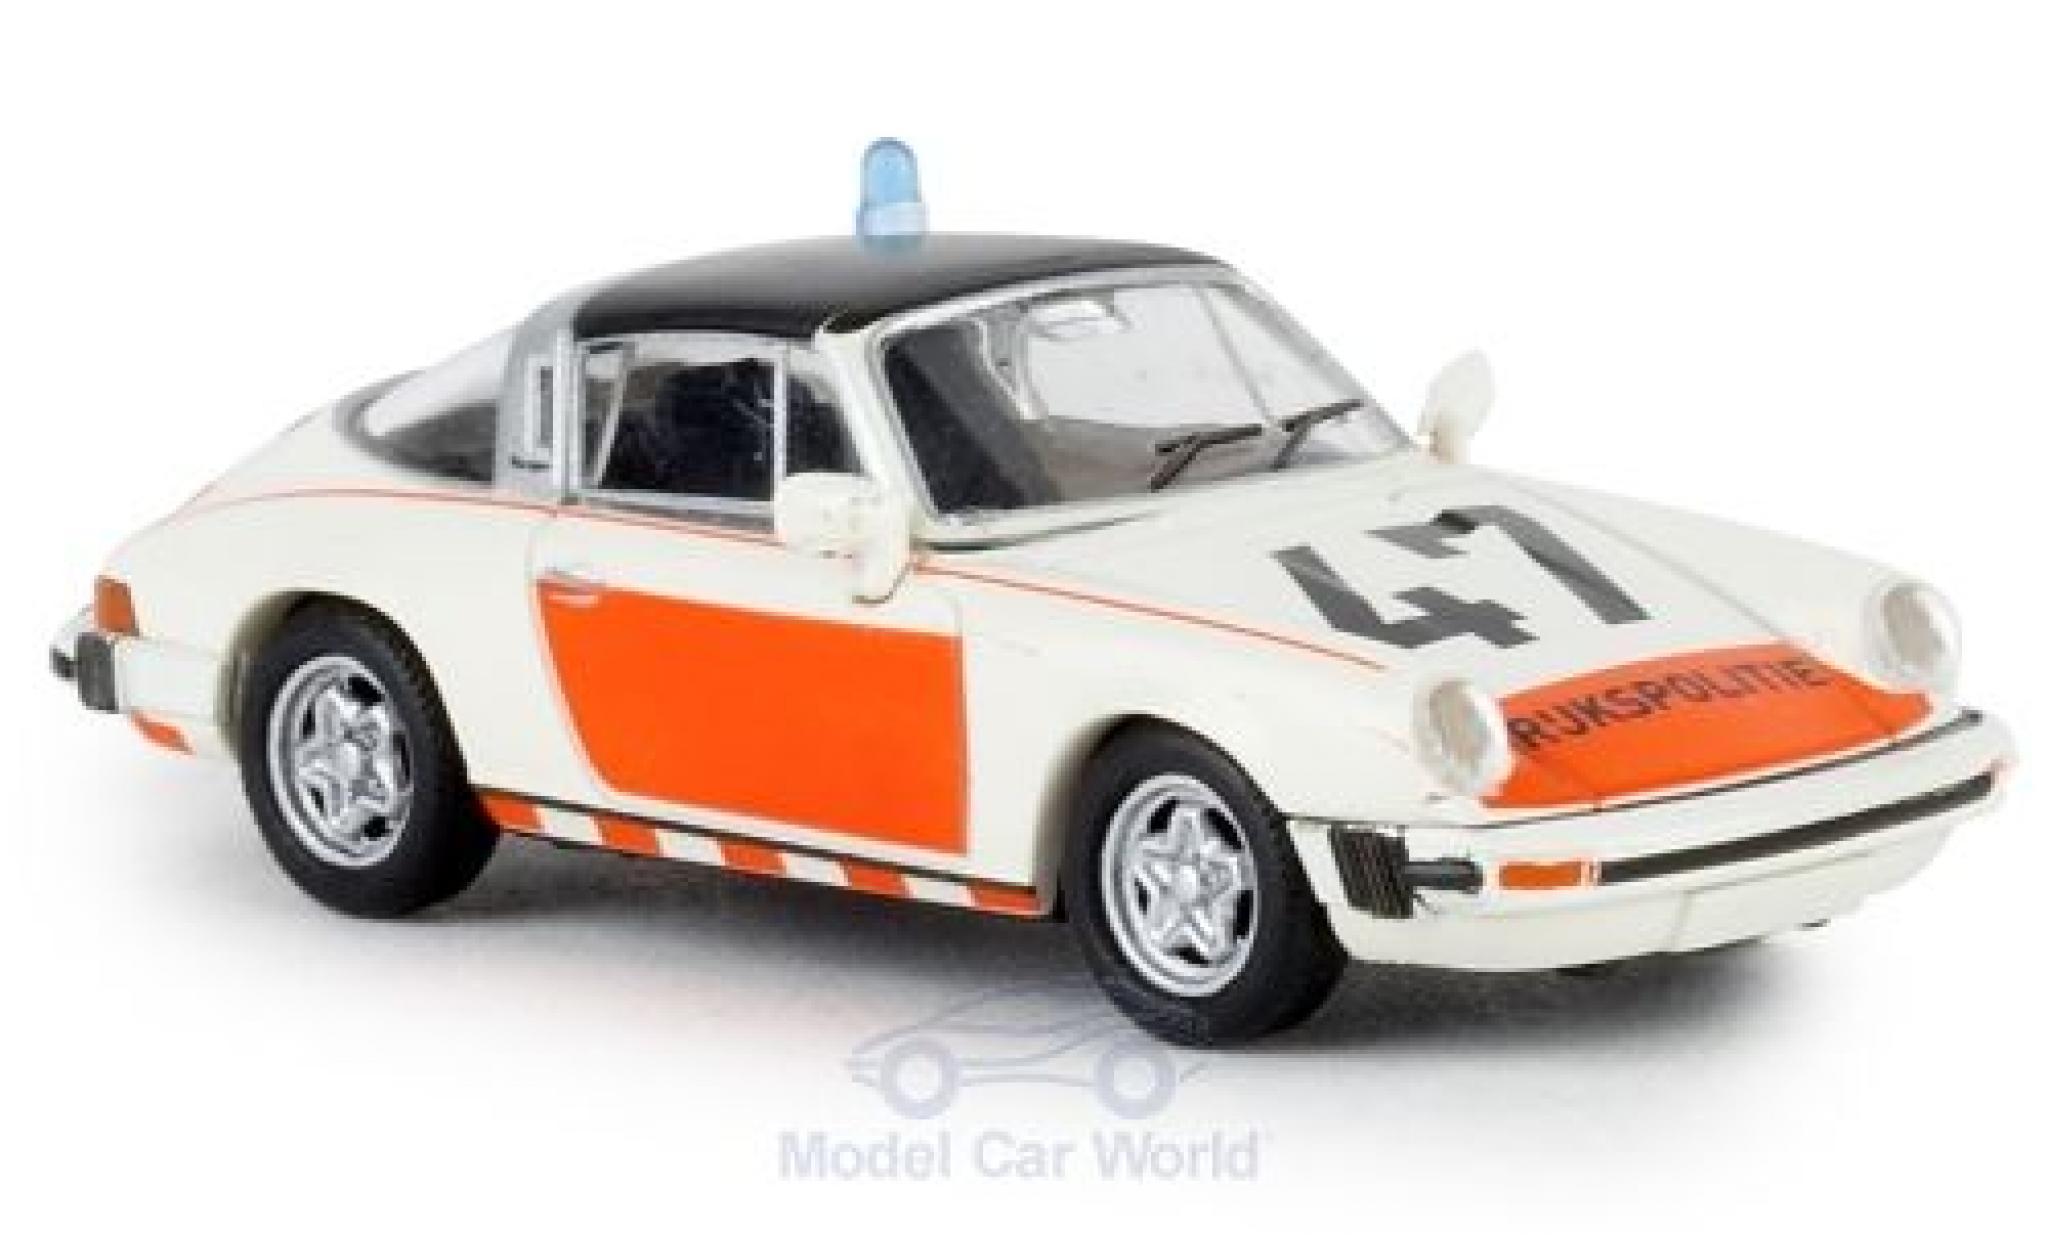 Porsche 930 Targa 1/87 Brekina 911 G Rijkspolitie 47 1976 TD